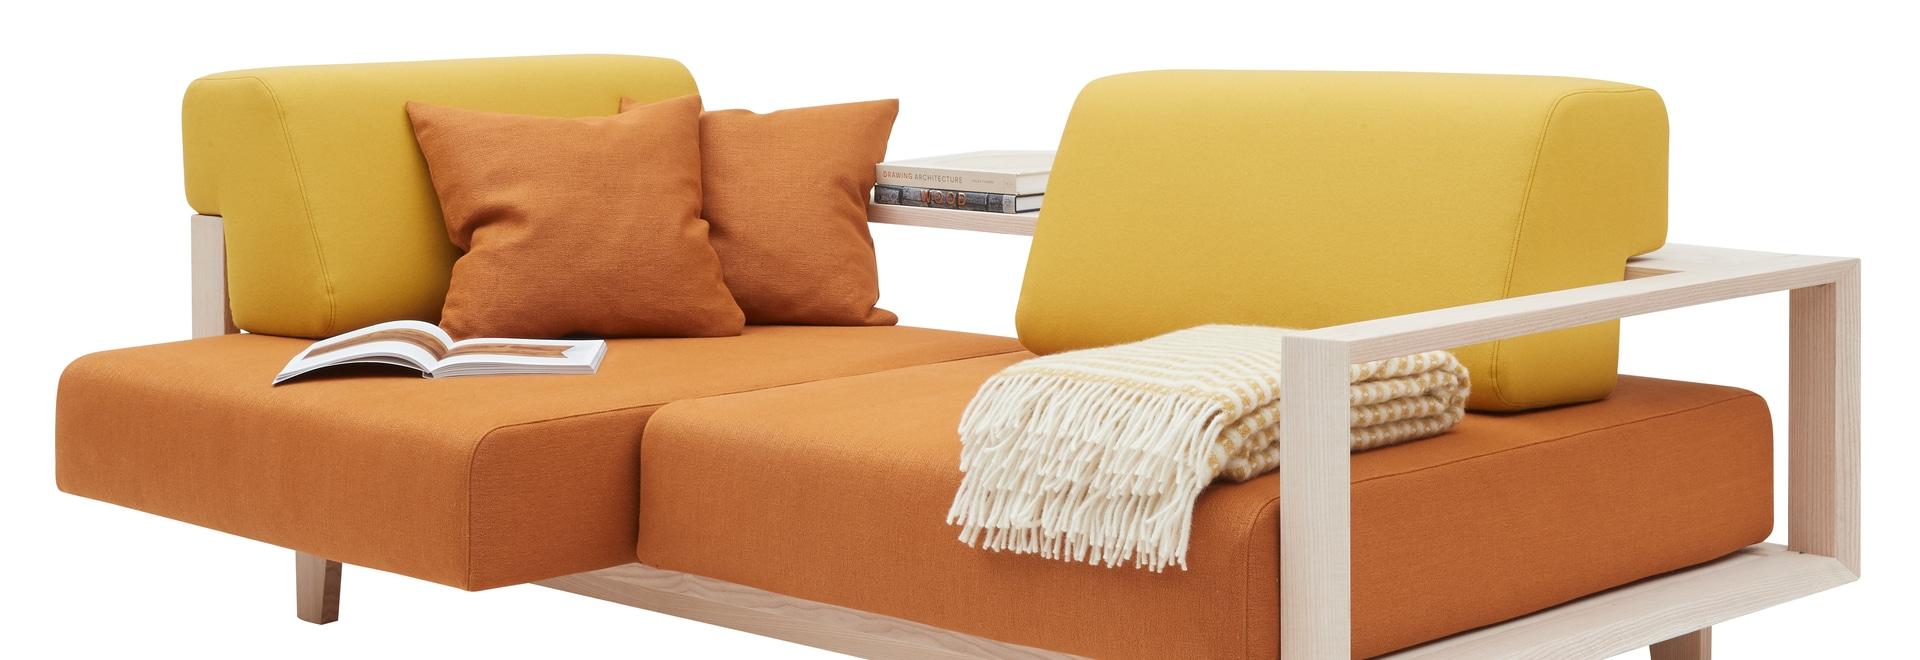 The new creative sofa WOOD